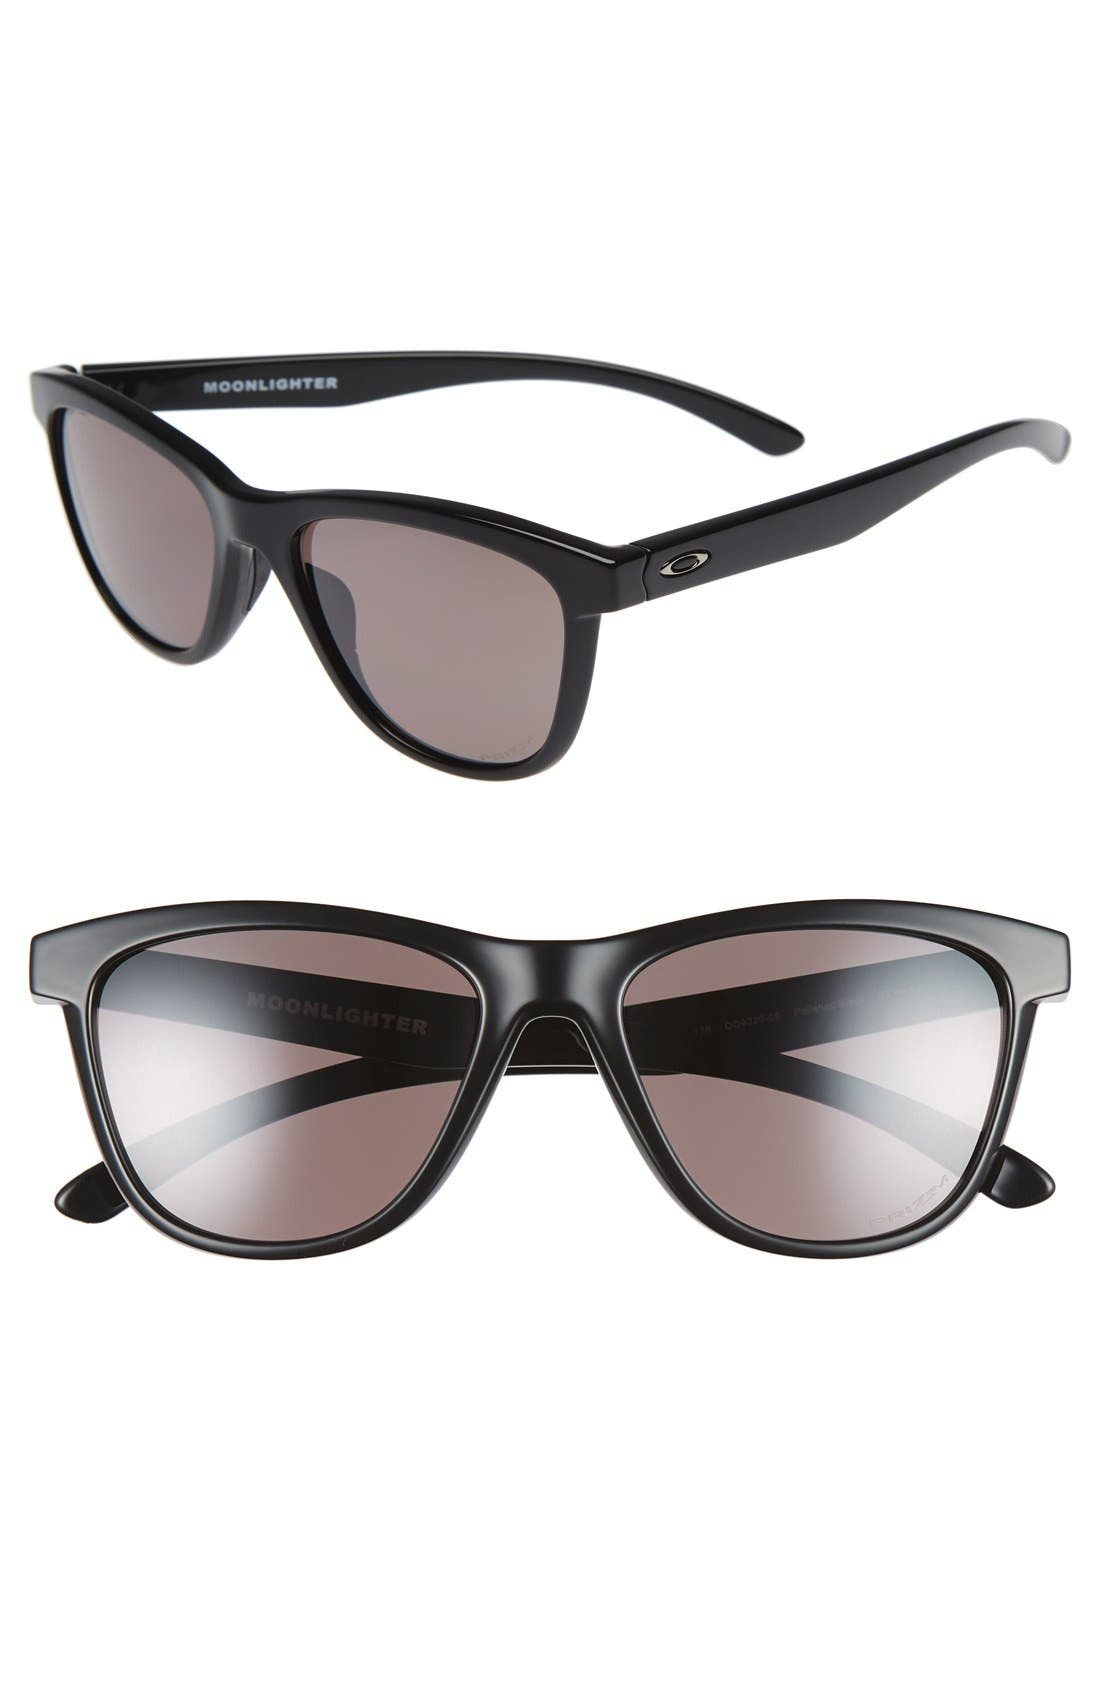 OAKLEY 'Moonlighter' 53mm Polarized Sunglasses